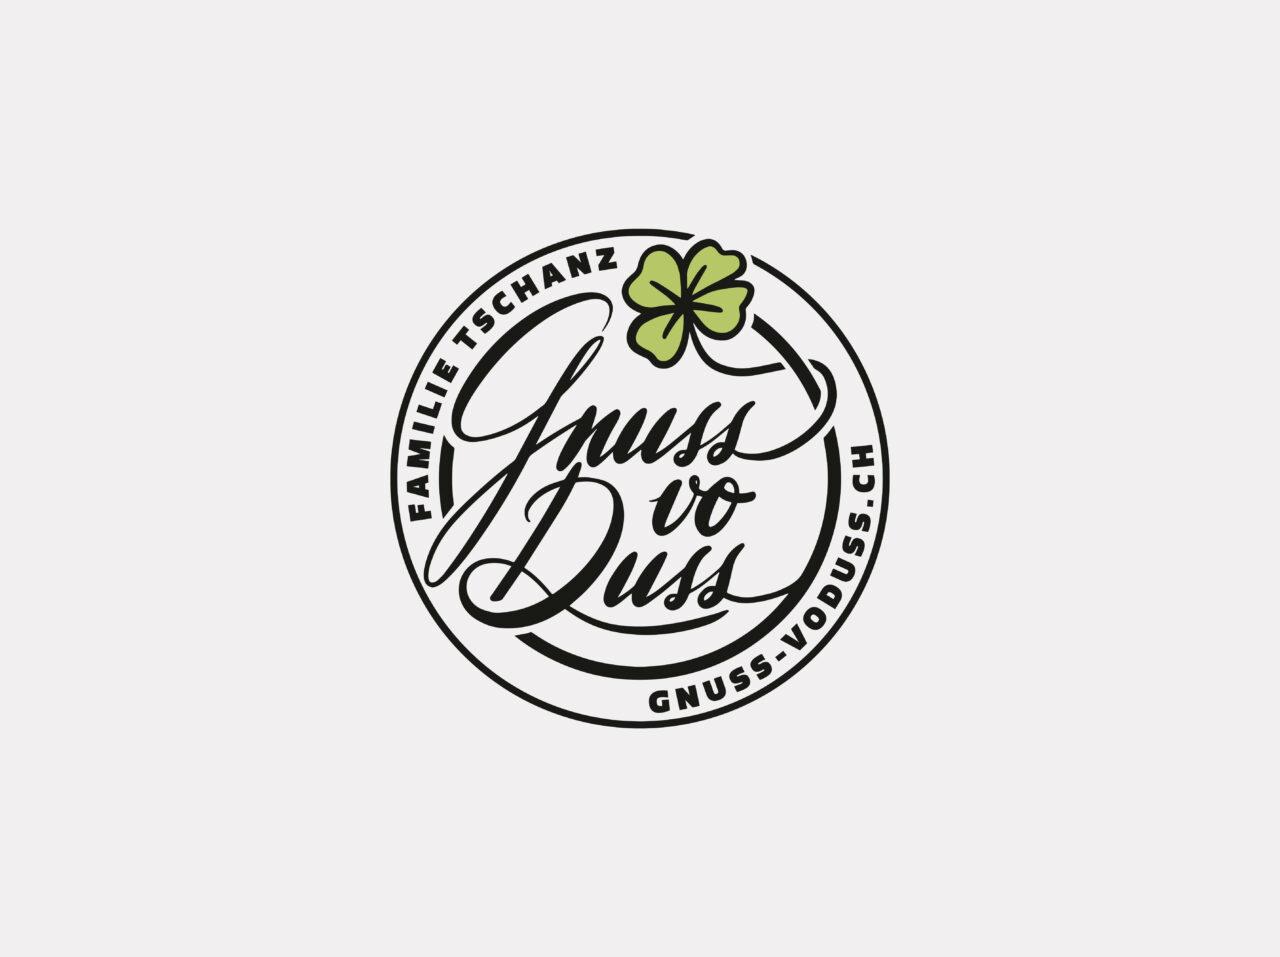 Logo Gnuss vo Duss